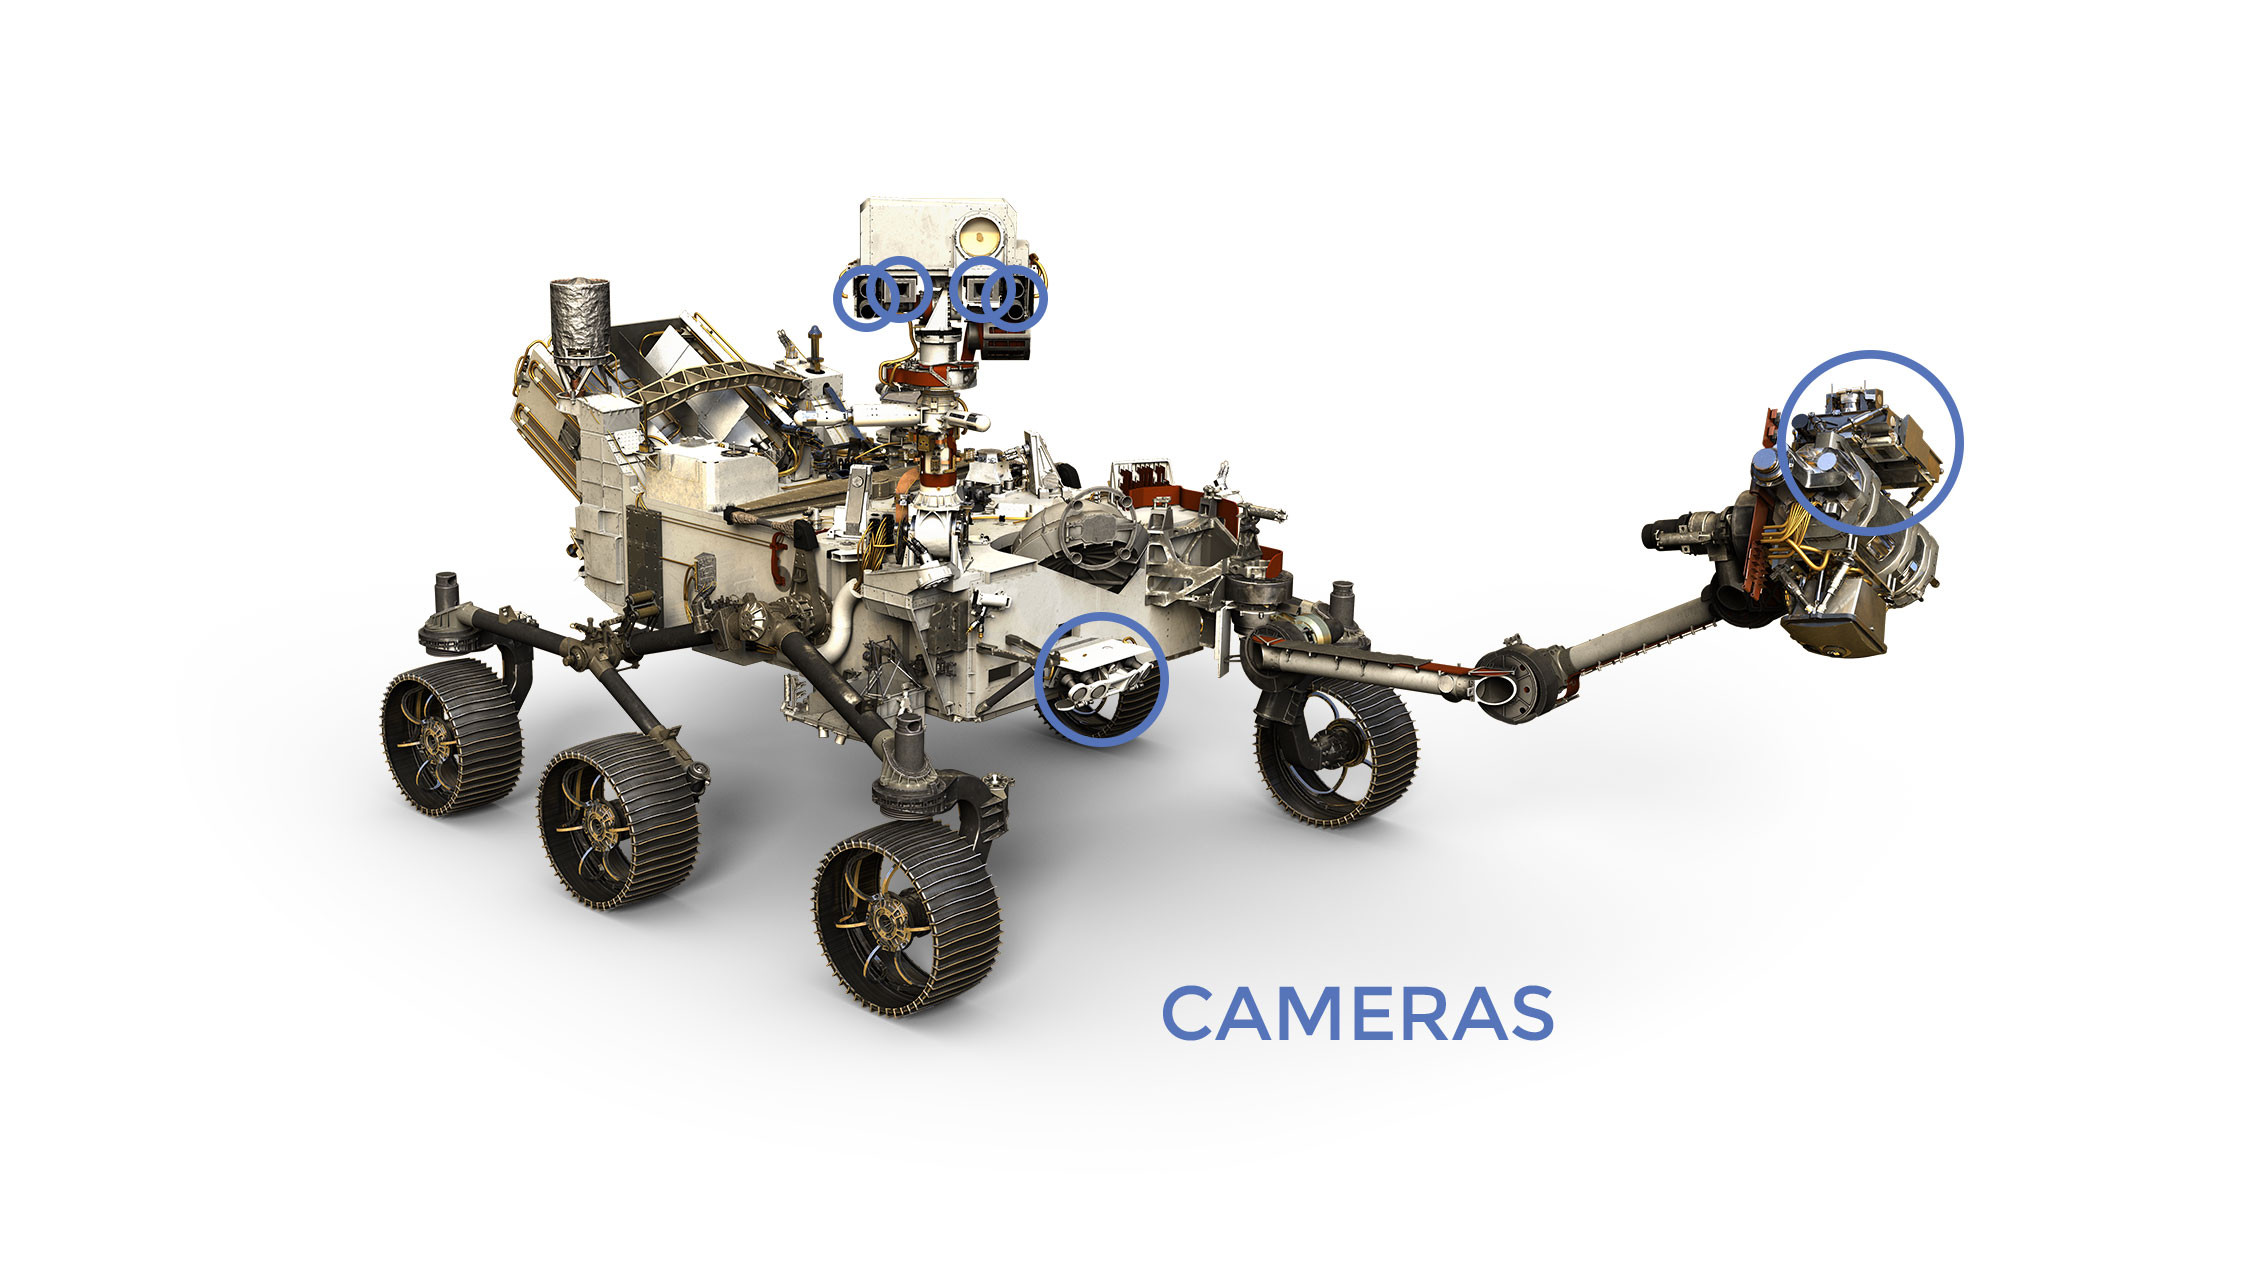 "<p>Фото: &copy;<a href=""https://mars.nasa.gov/mars2020/mission/rover/cameras/"" target=""_blank"">mars.nasa.gov</a></p>"